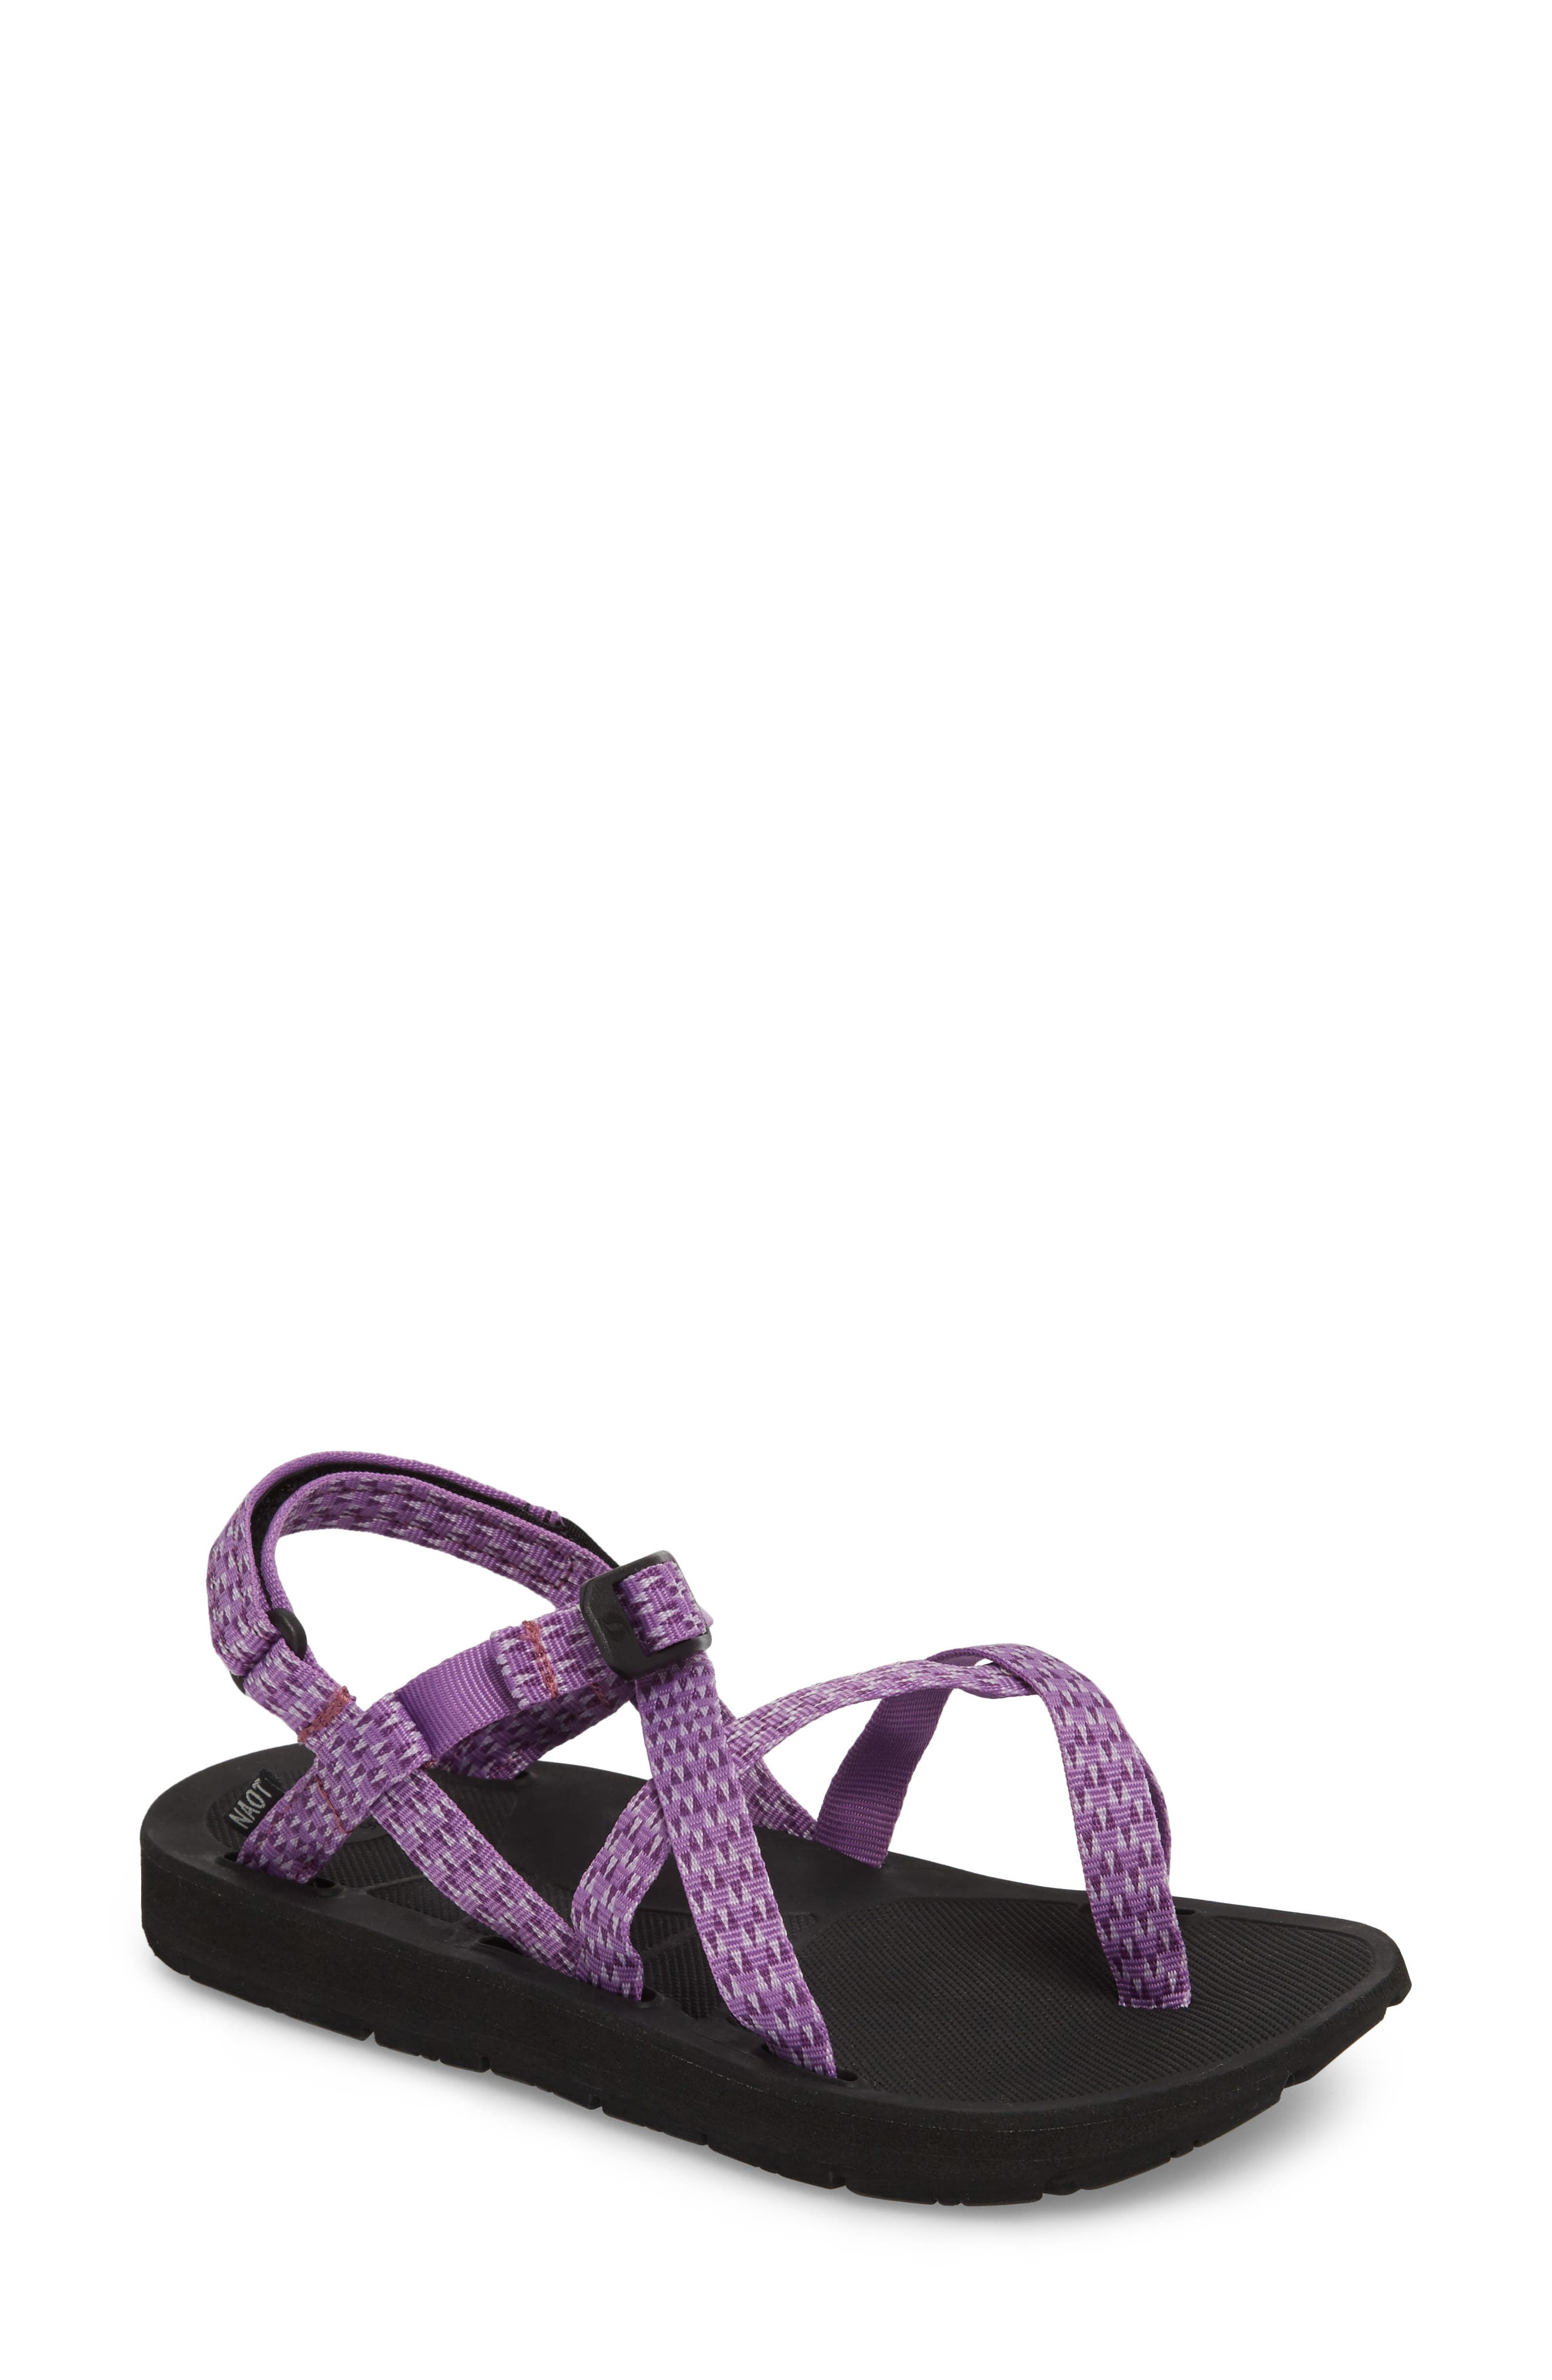 Shore Sandal,                             Main thumbnail 1, color,                             Purple Triangles Fabric